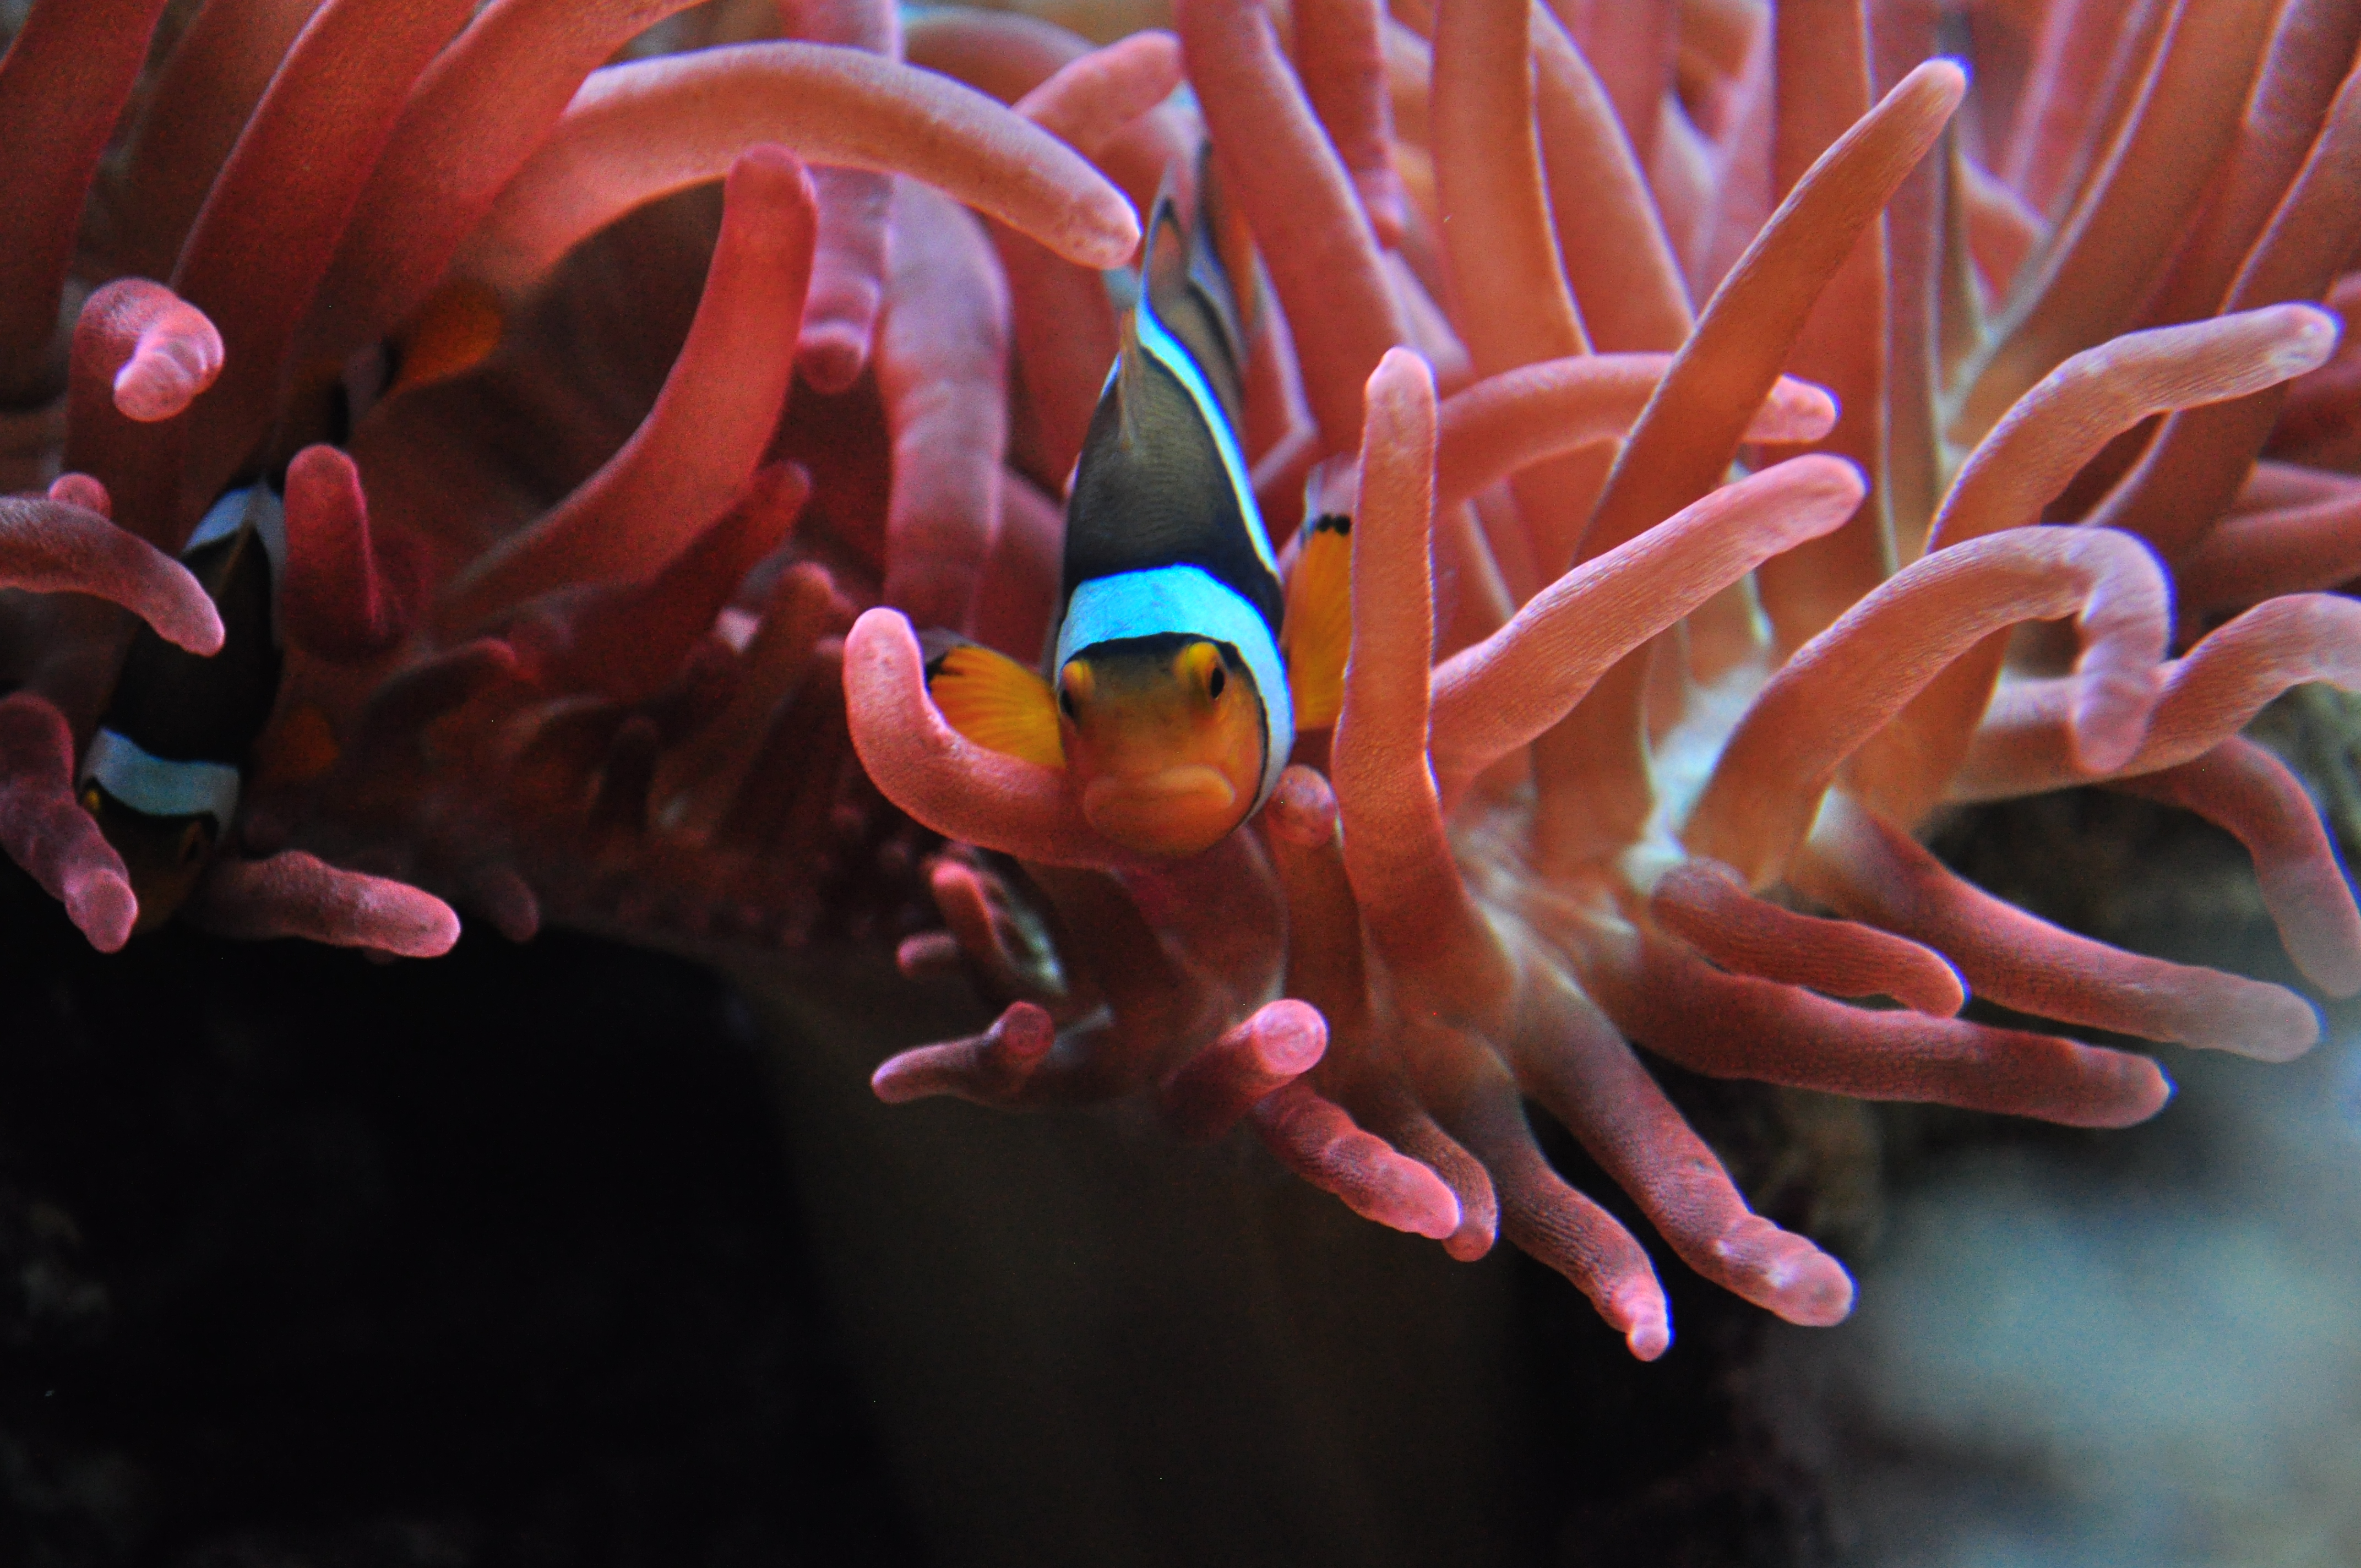 File:Seattle Aquarium 092 - Tropical Pacific - clownfish and sea ...